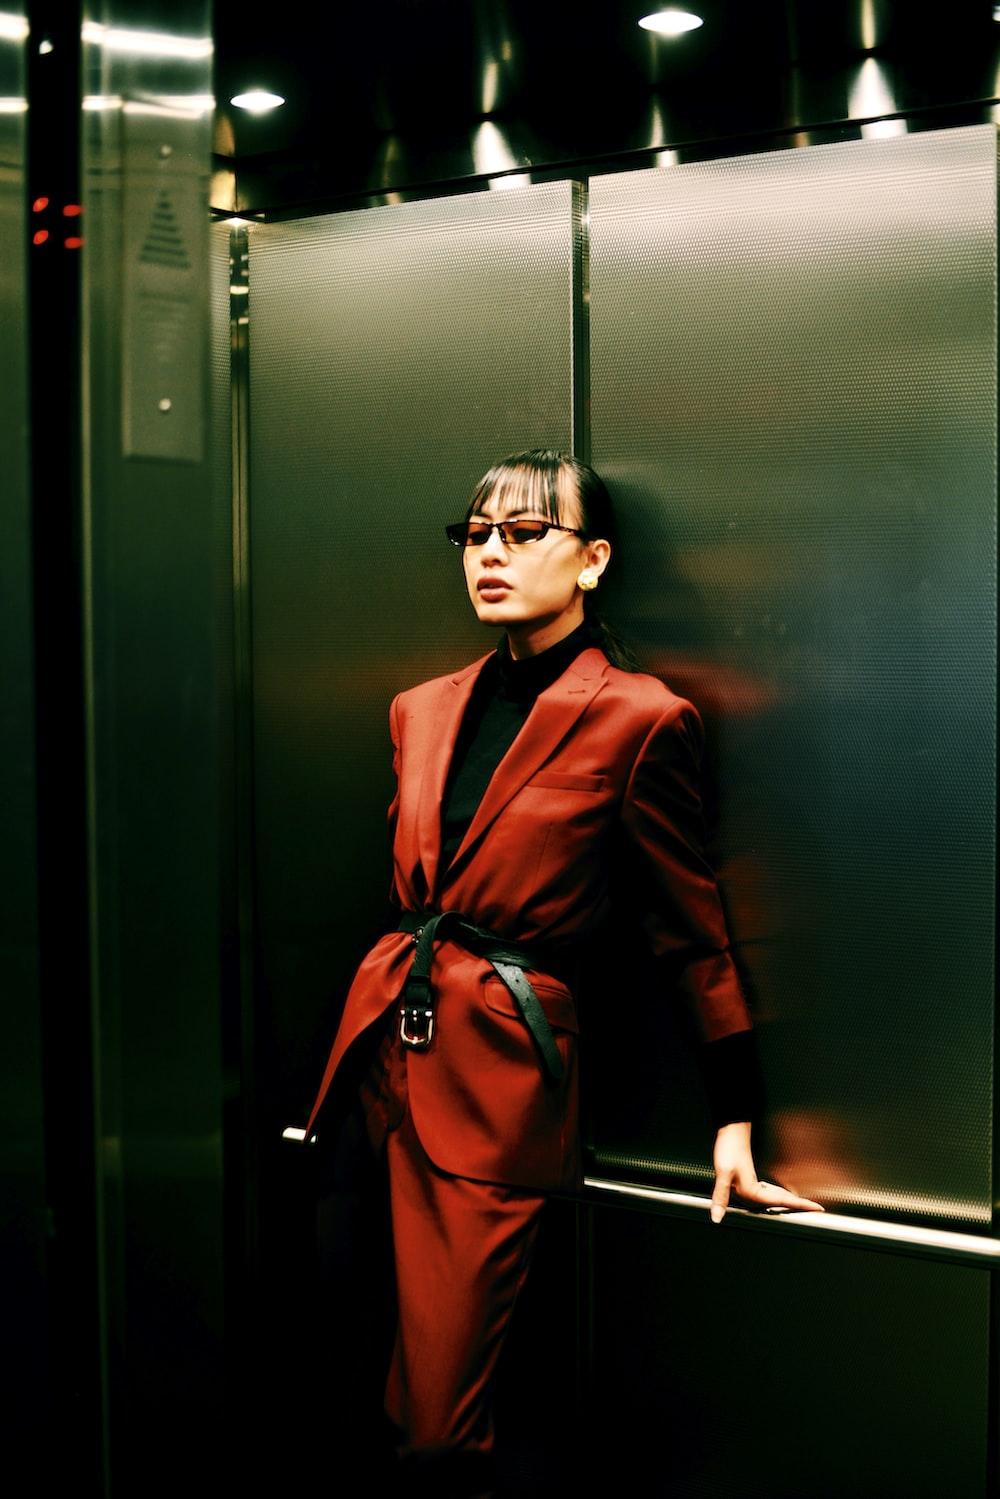 woman in red blazer in elevator